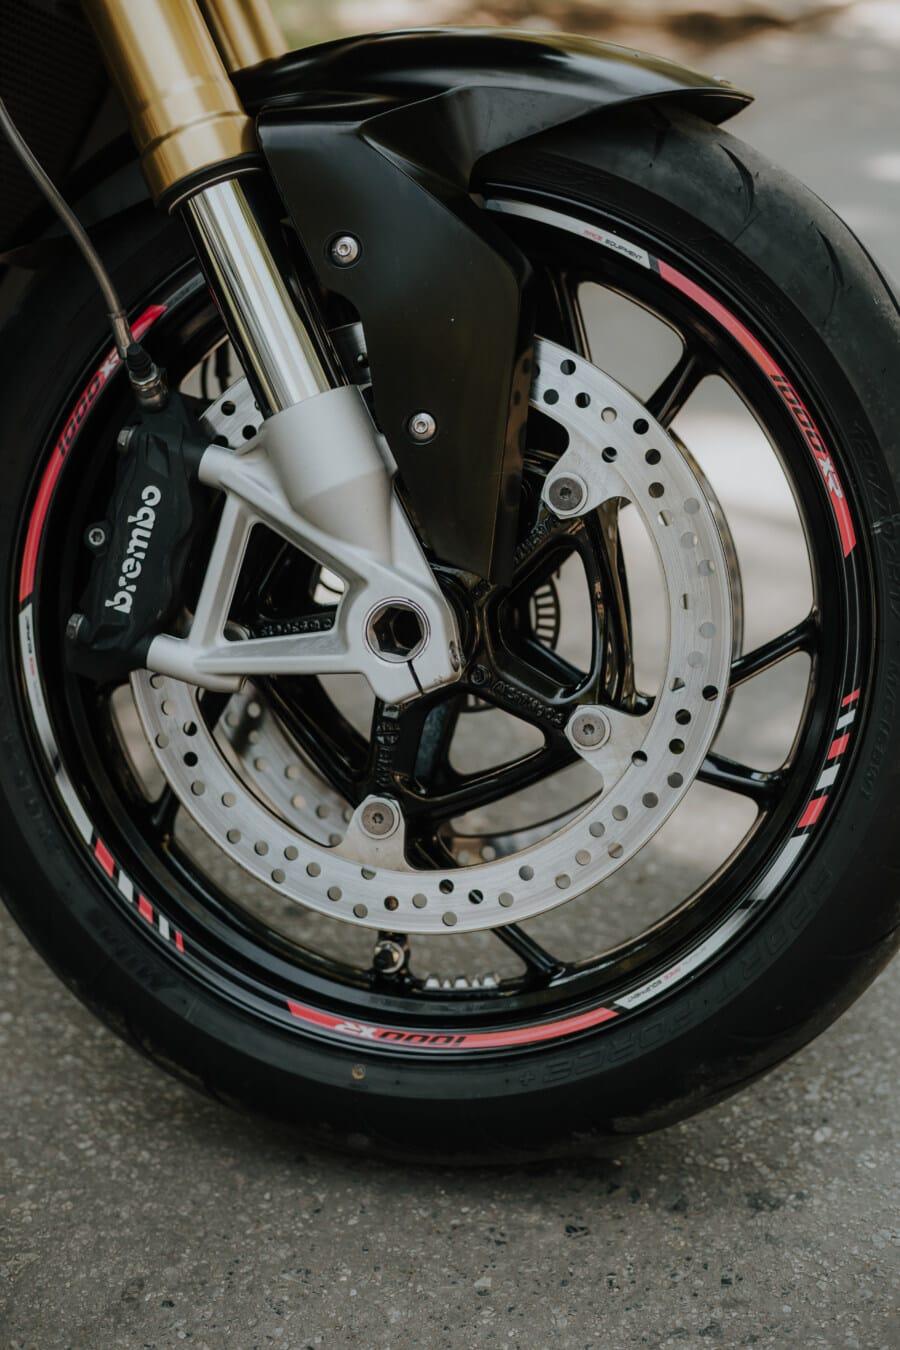 tire, disk, brake, motorbike, motorcycle, rim, aluminum, wheel, bike, vehicle